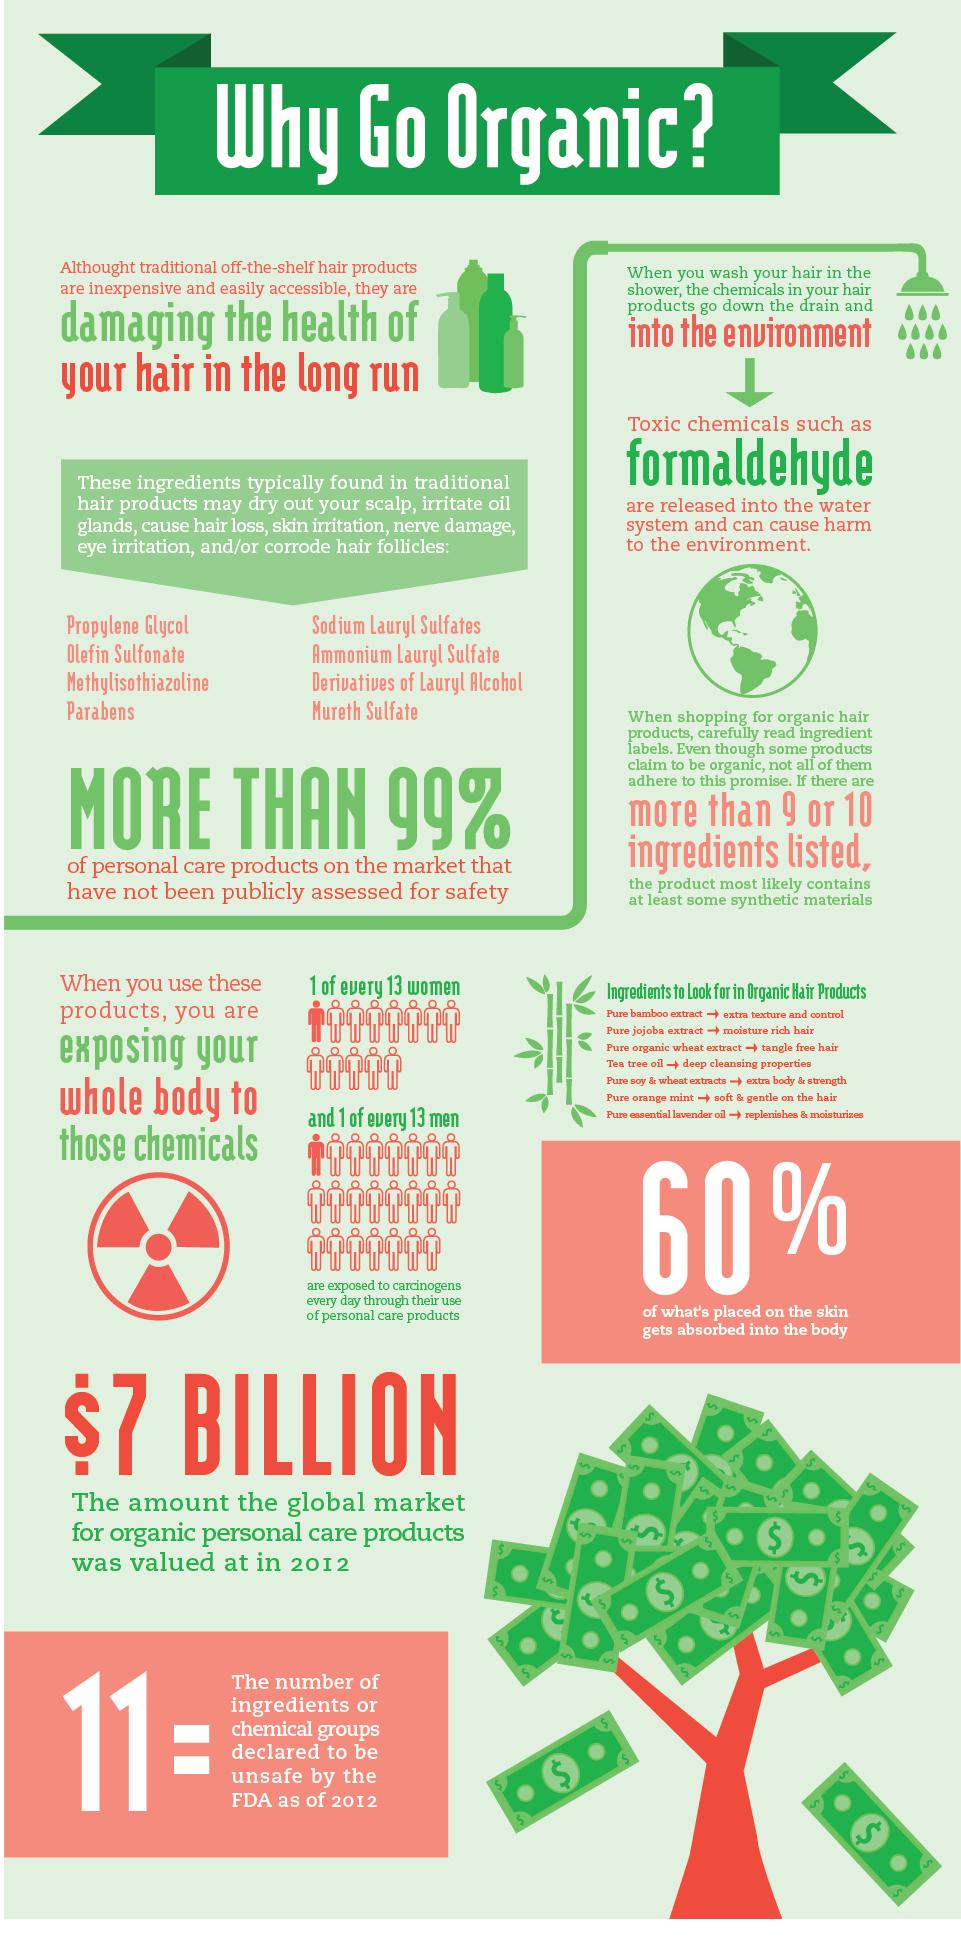 goorganic infographic